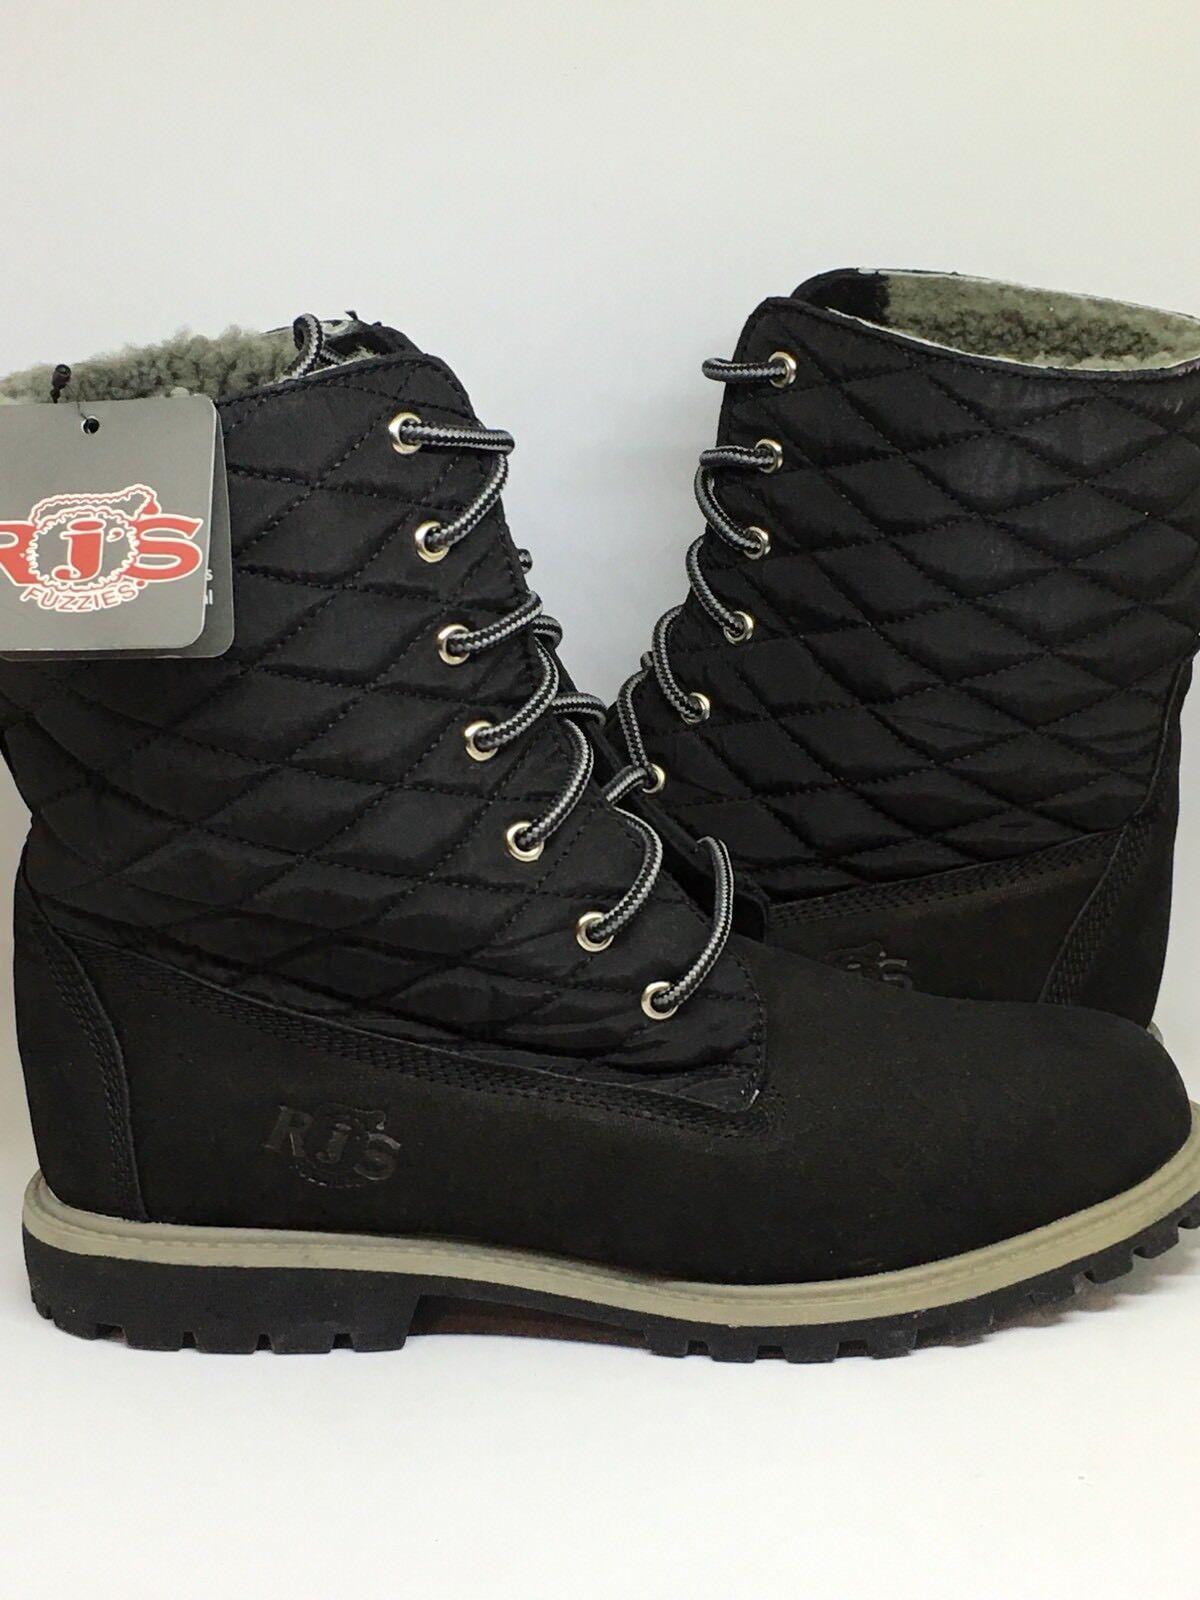 RJ's Fuzzies Jojo Women's 9, Winter Boots UK Size 9, Women's EU 42 bcc152